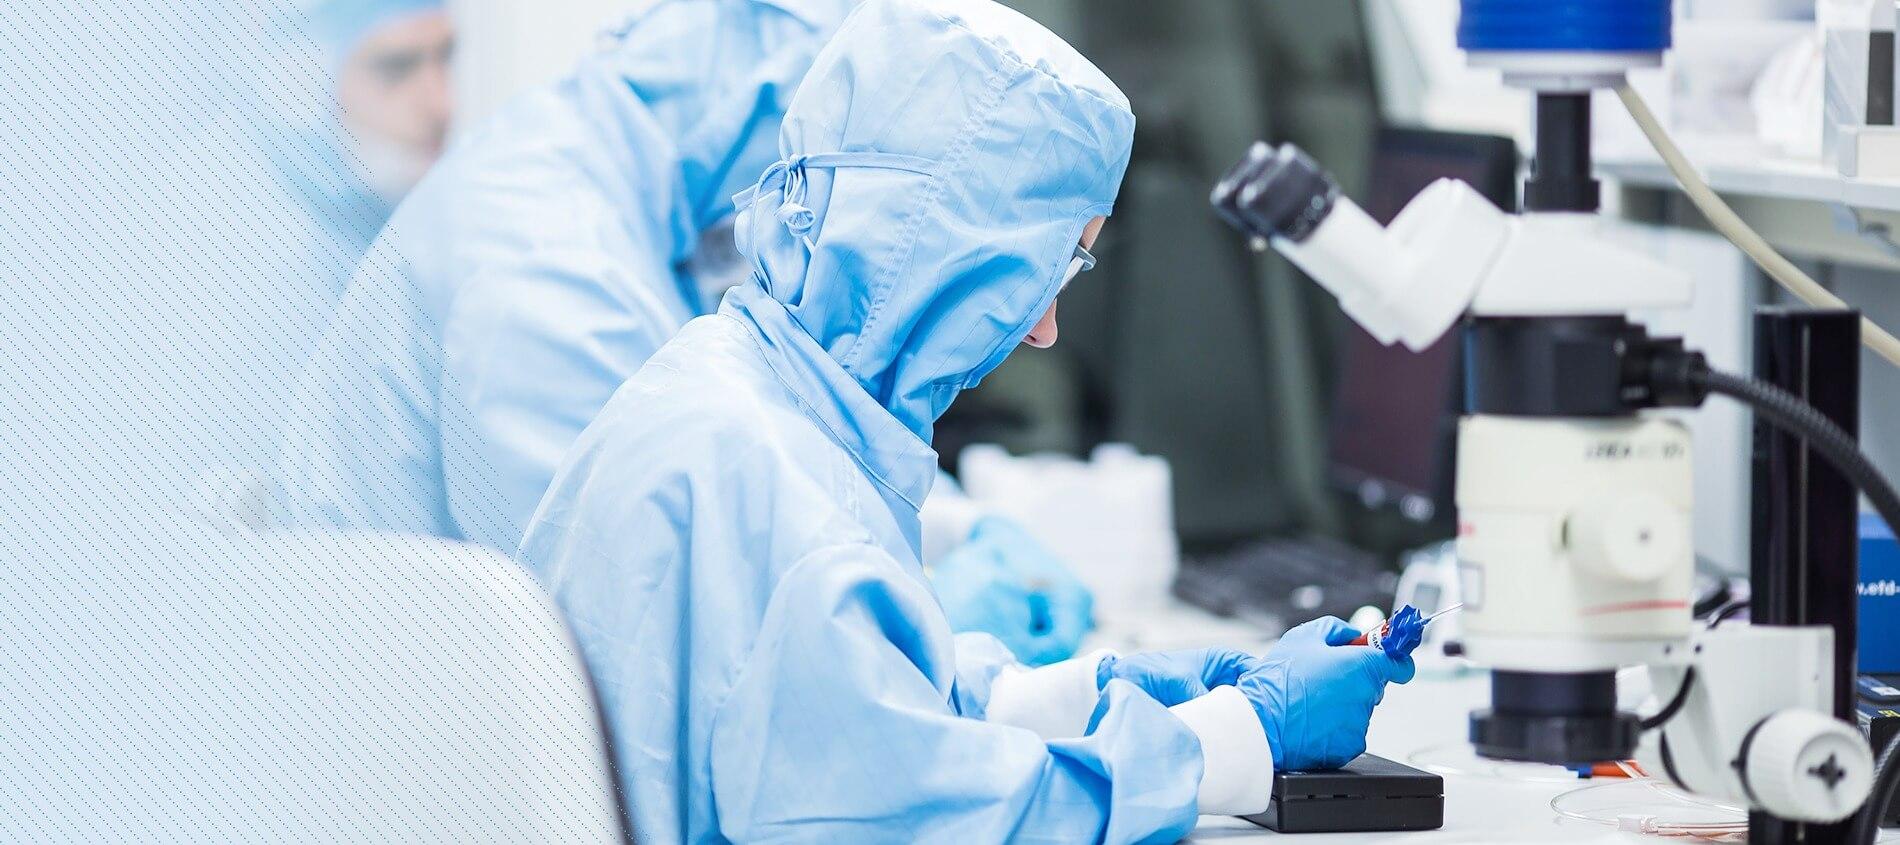 Microfluidic Custom Design and Mass-Manufacturing